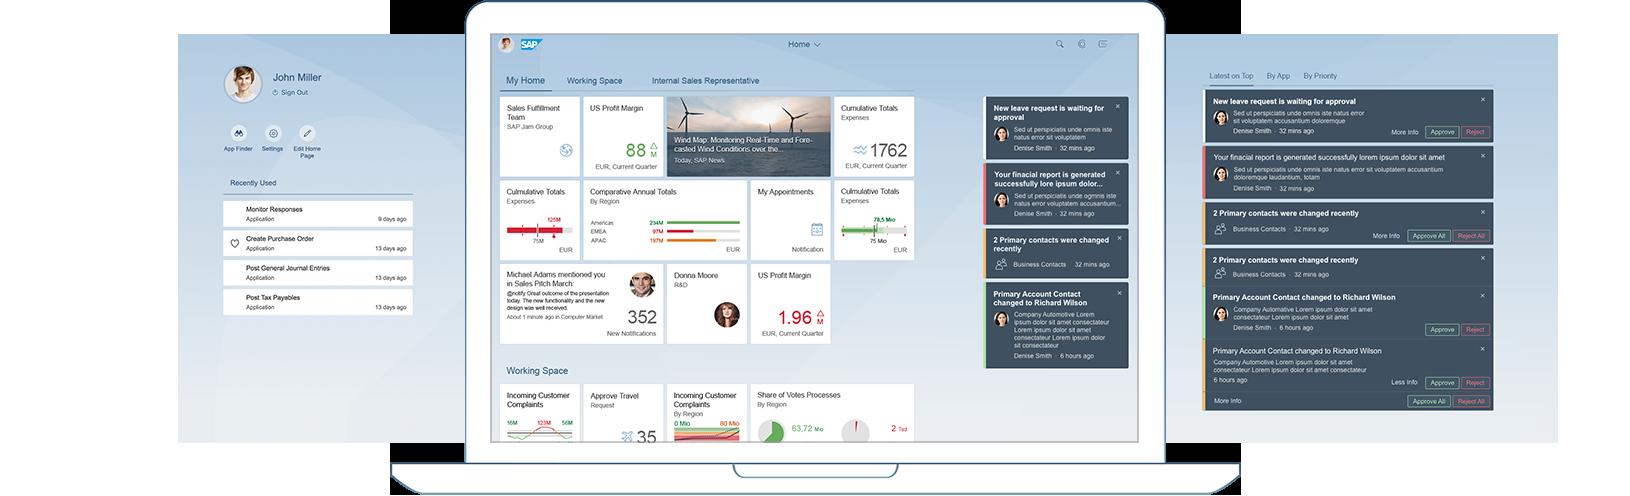 Fiori 2.0 Launchpad Viewport